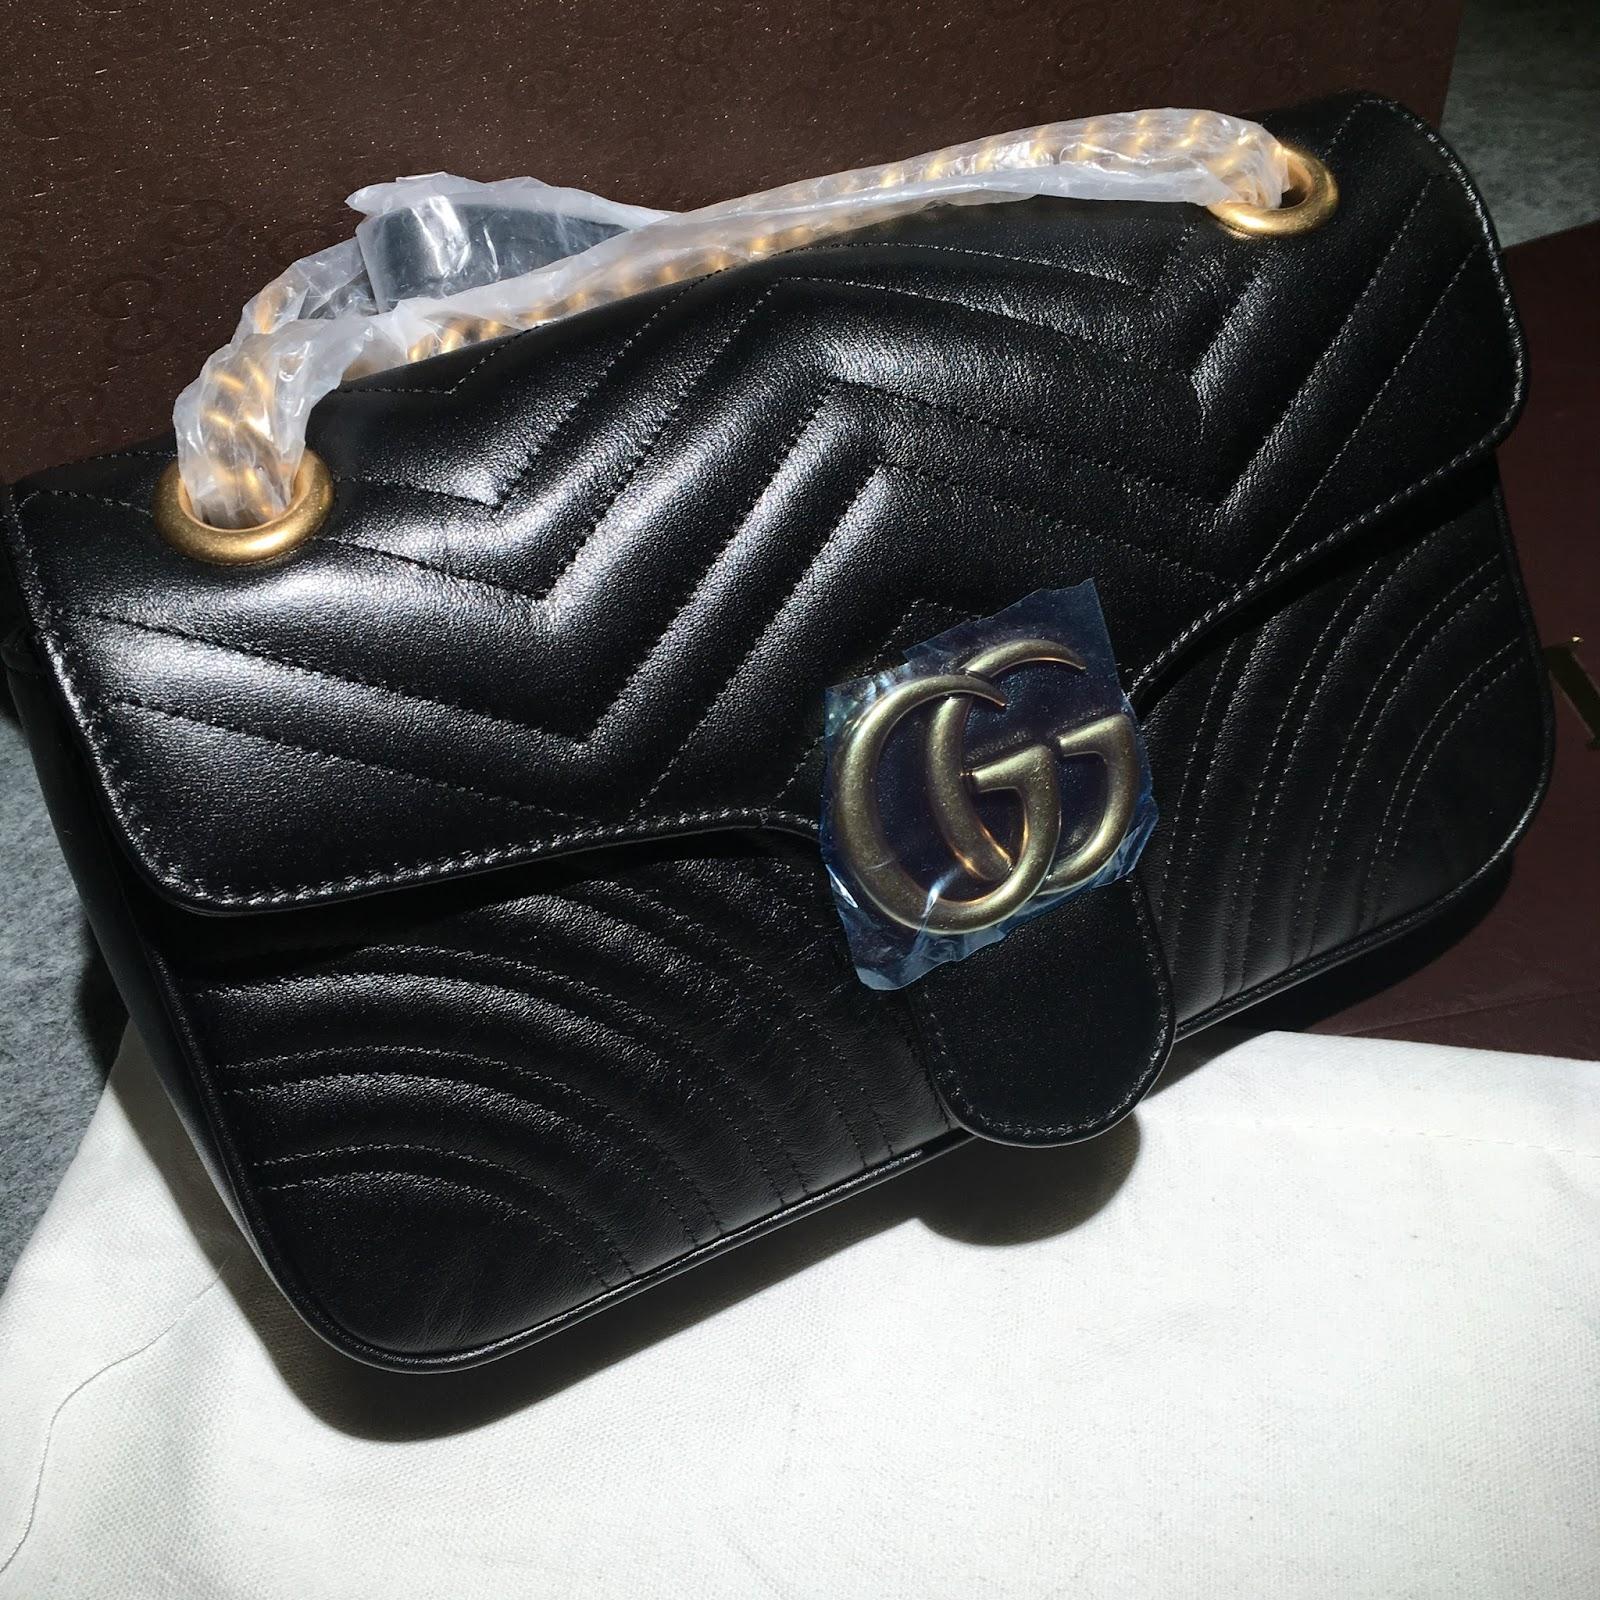 afa58bd2781 Gucci marmont bag black in cowskin best original quality pre shipment photos